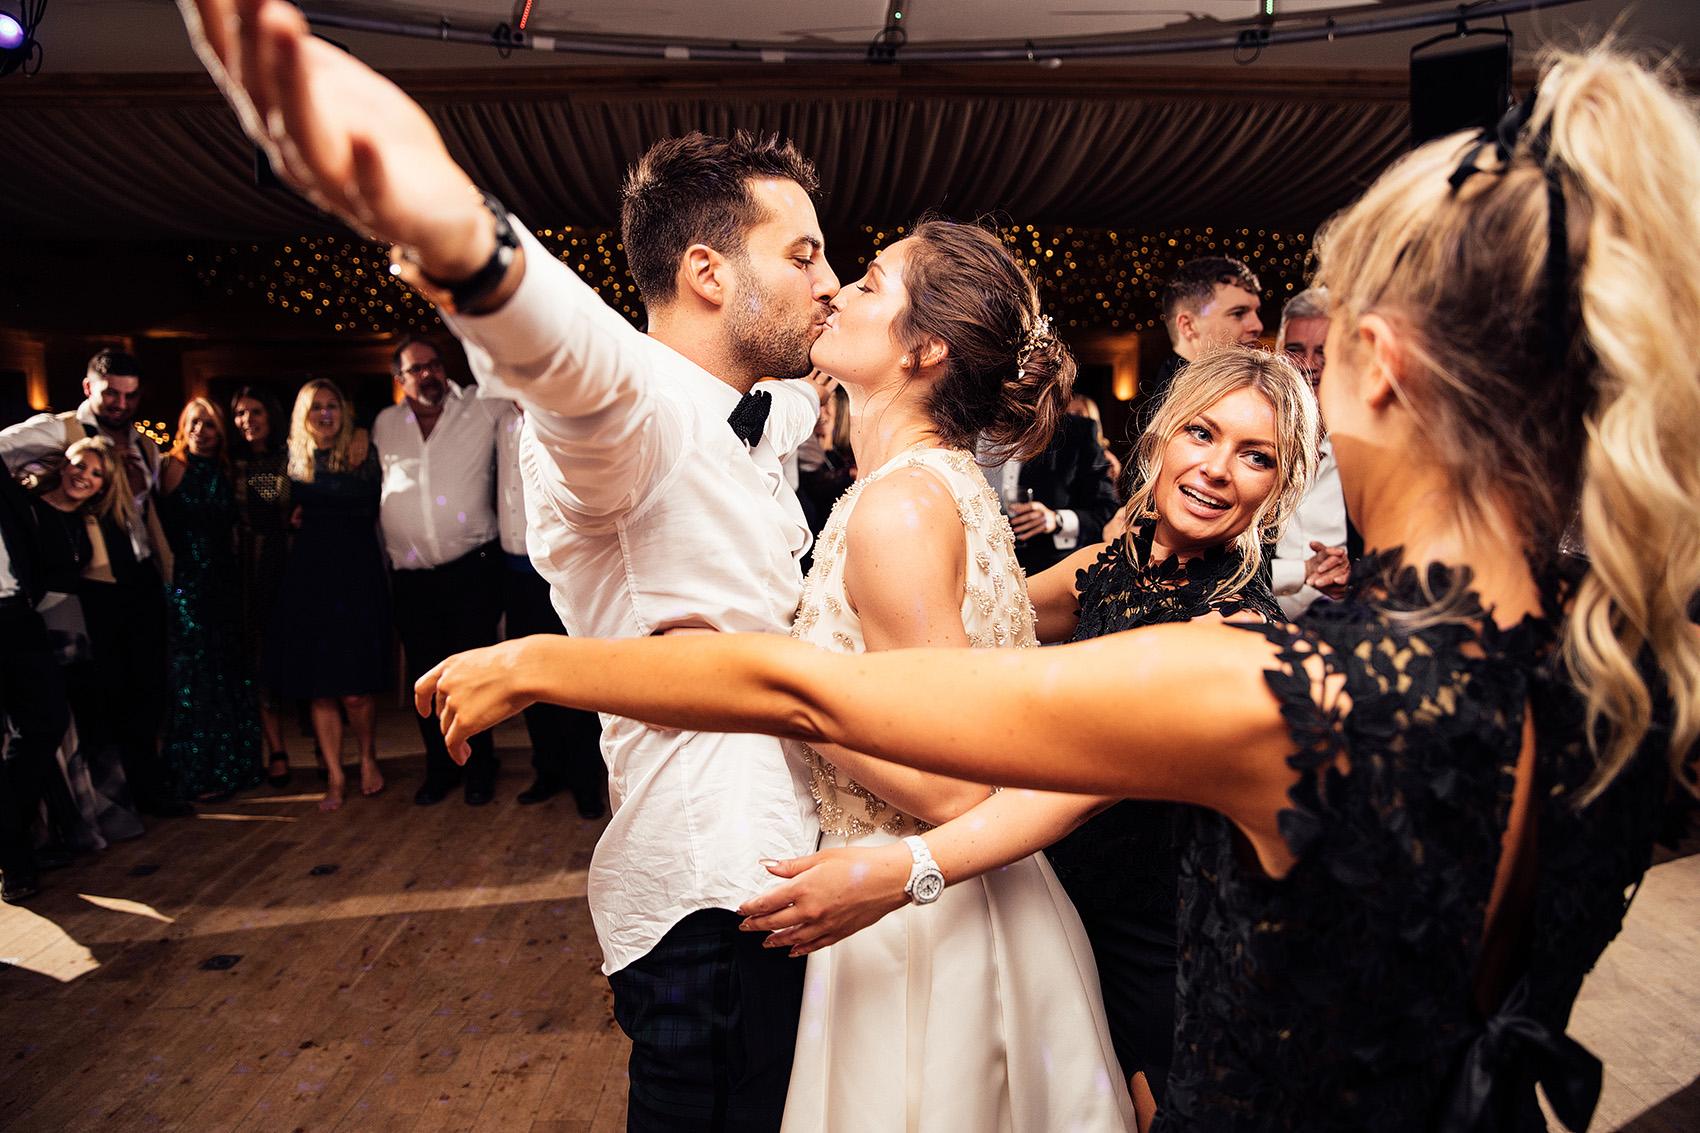 elmore-court-wedding-photography-99.jpg